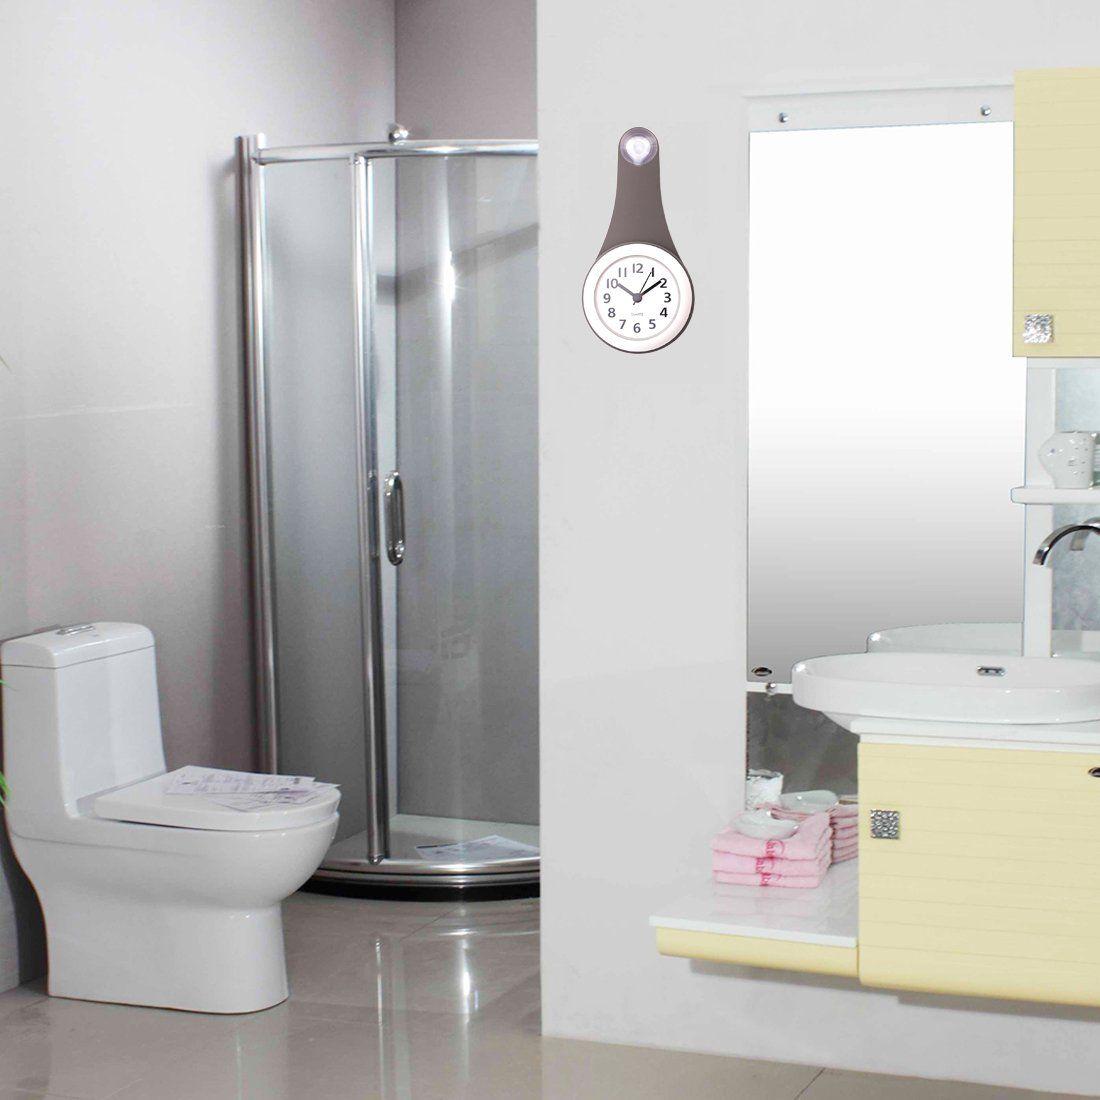 Wall Clock Lingxuinfo Household Bathroom Waterproof Small Digital